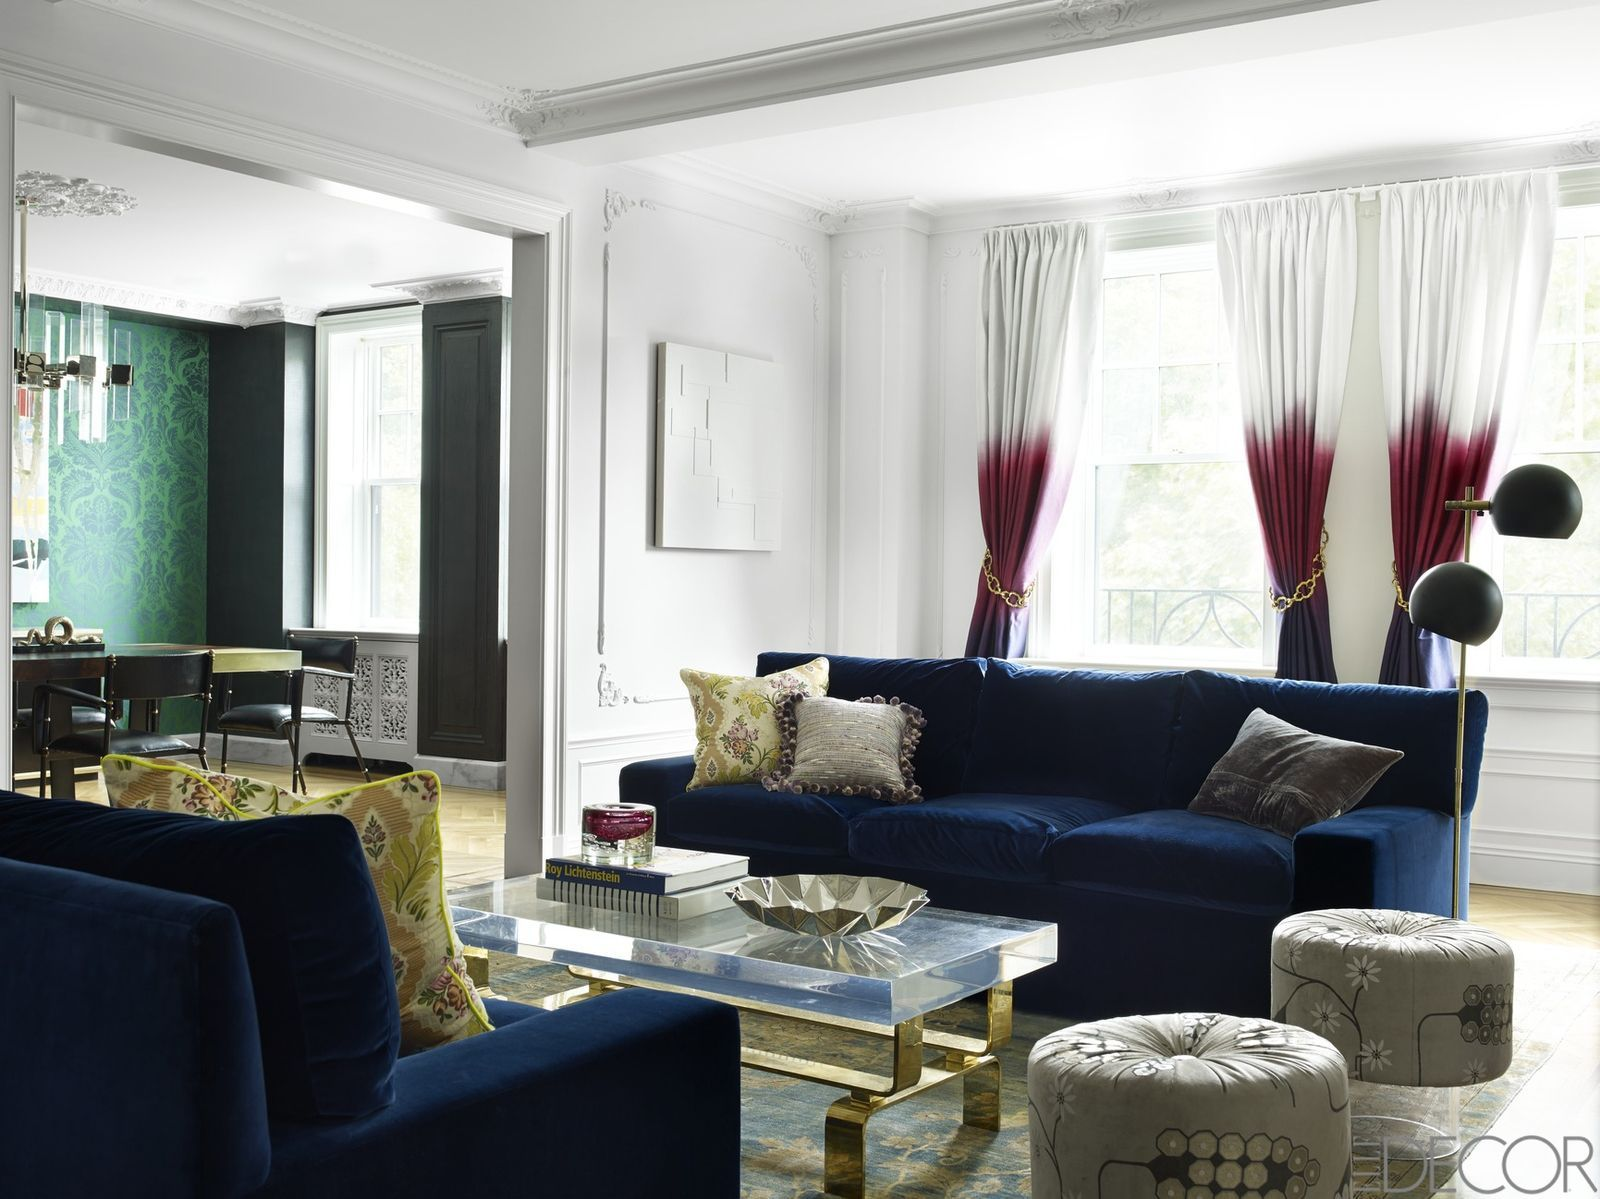 35 Brilliant Curtain Ideas For An Elegant And Vibrant Living Room    ELLEDecor.com